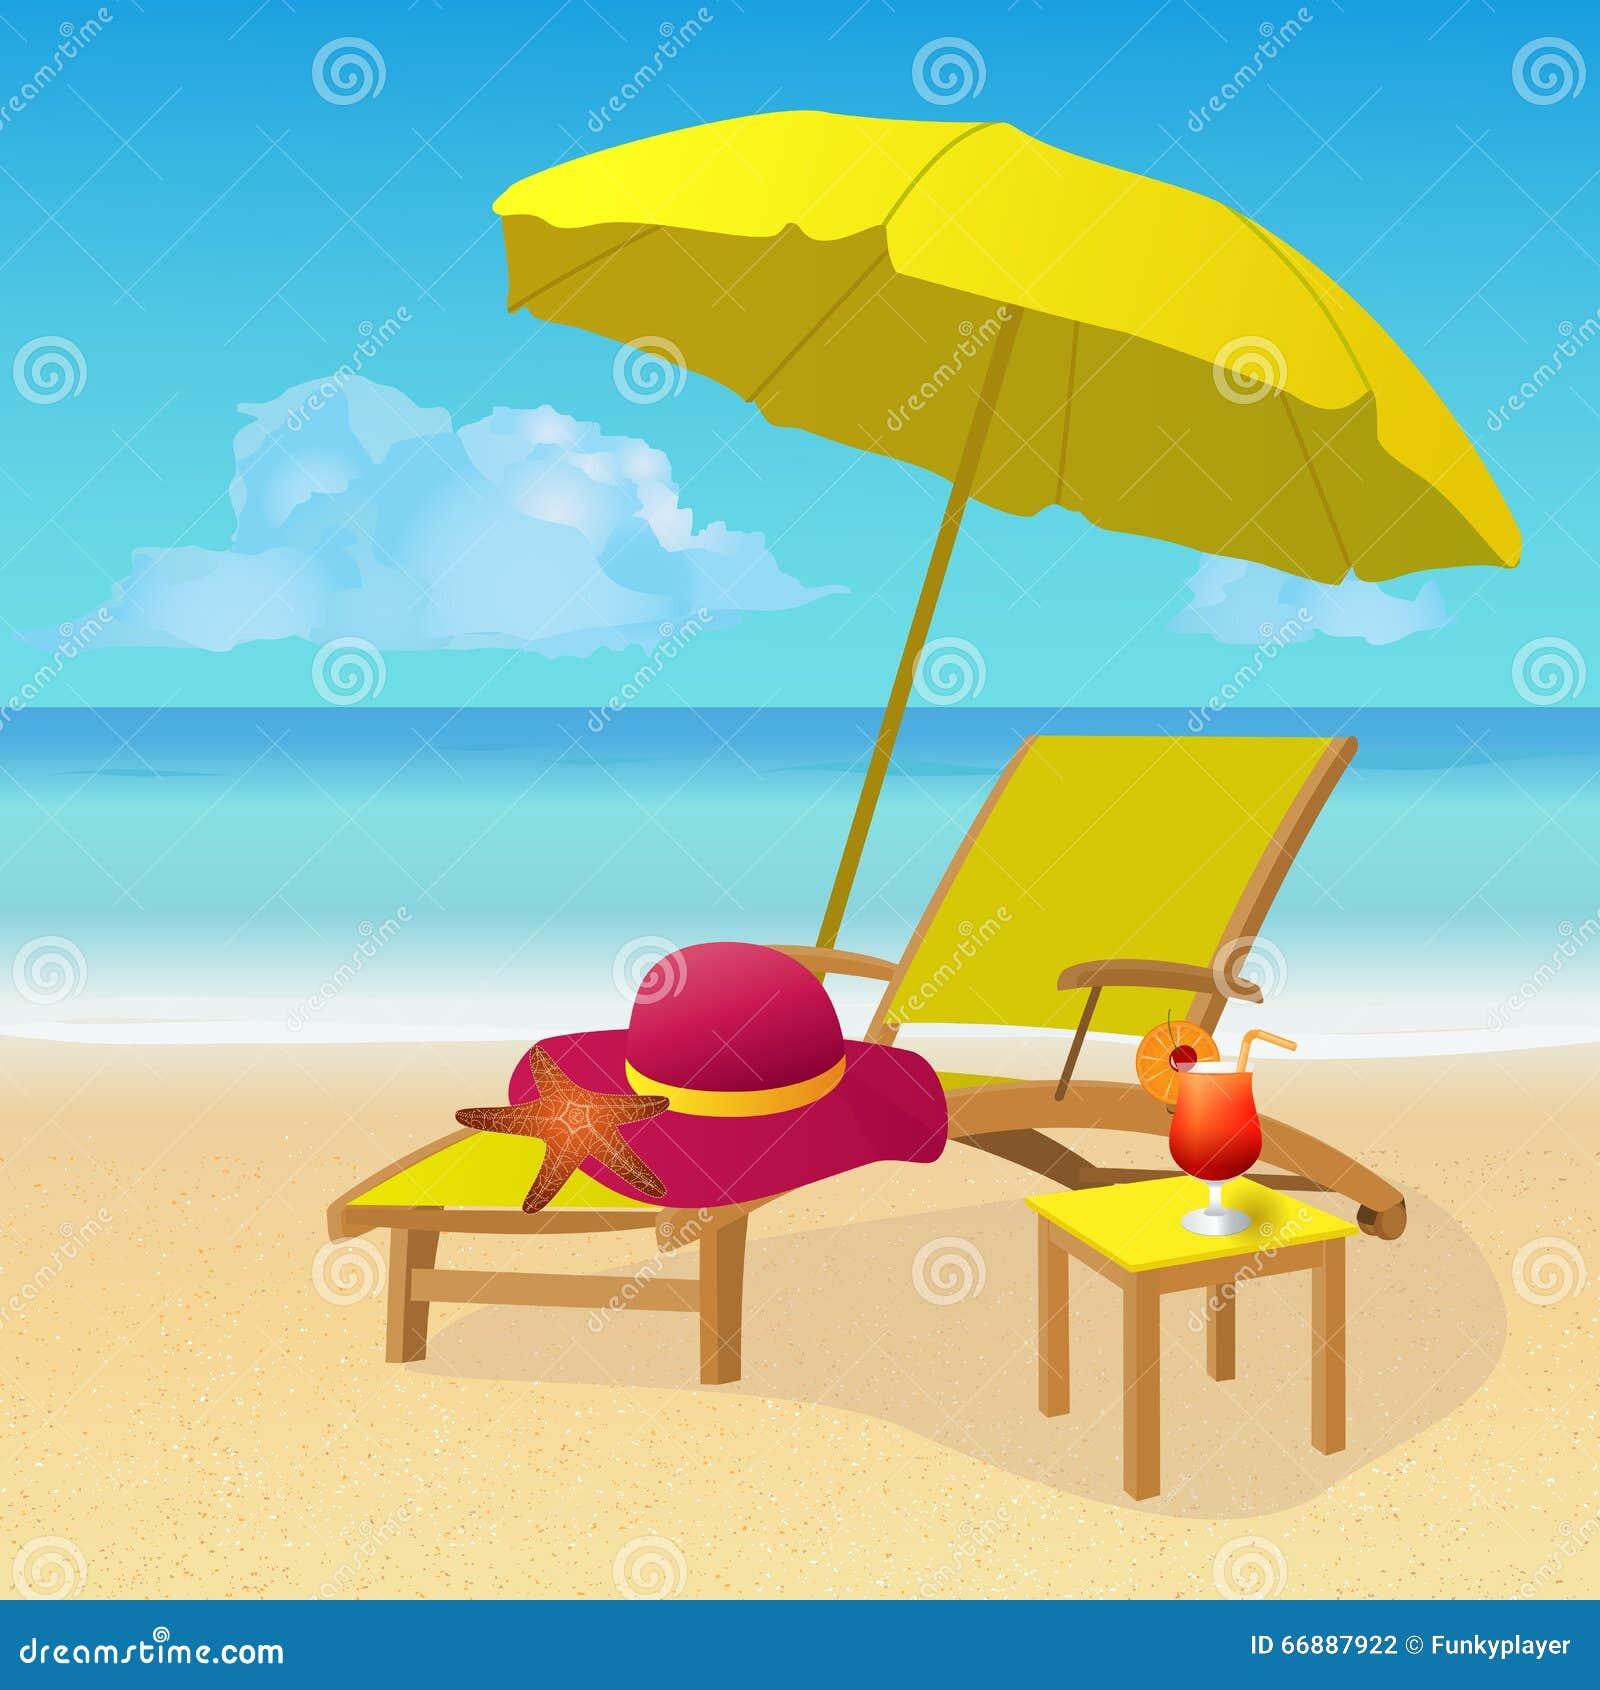 Chaise Lounge With Umbrella On Idyllic Tropical Sandy Beach